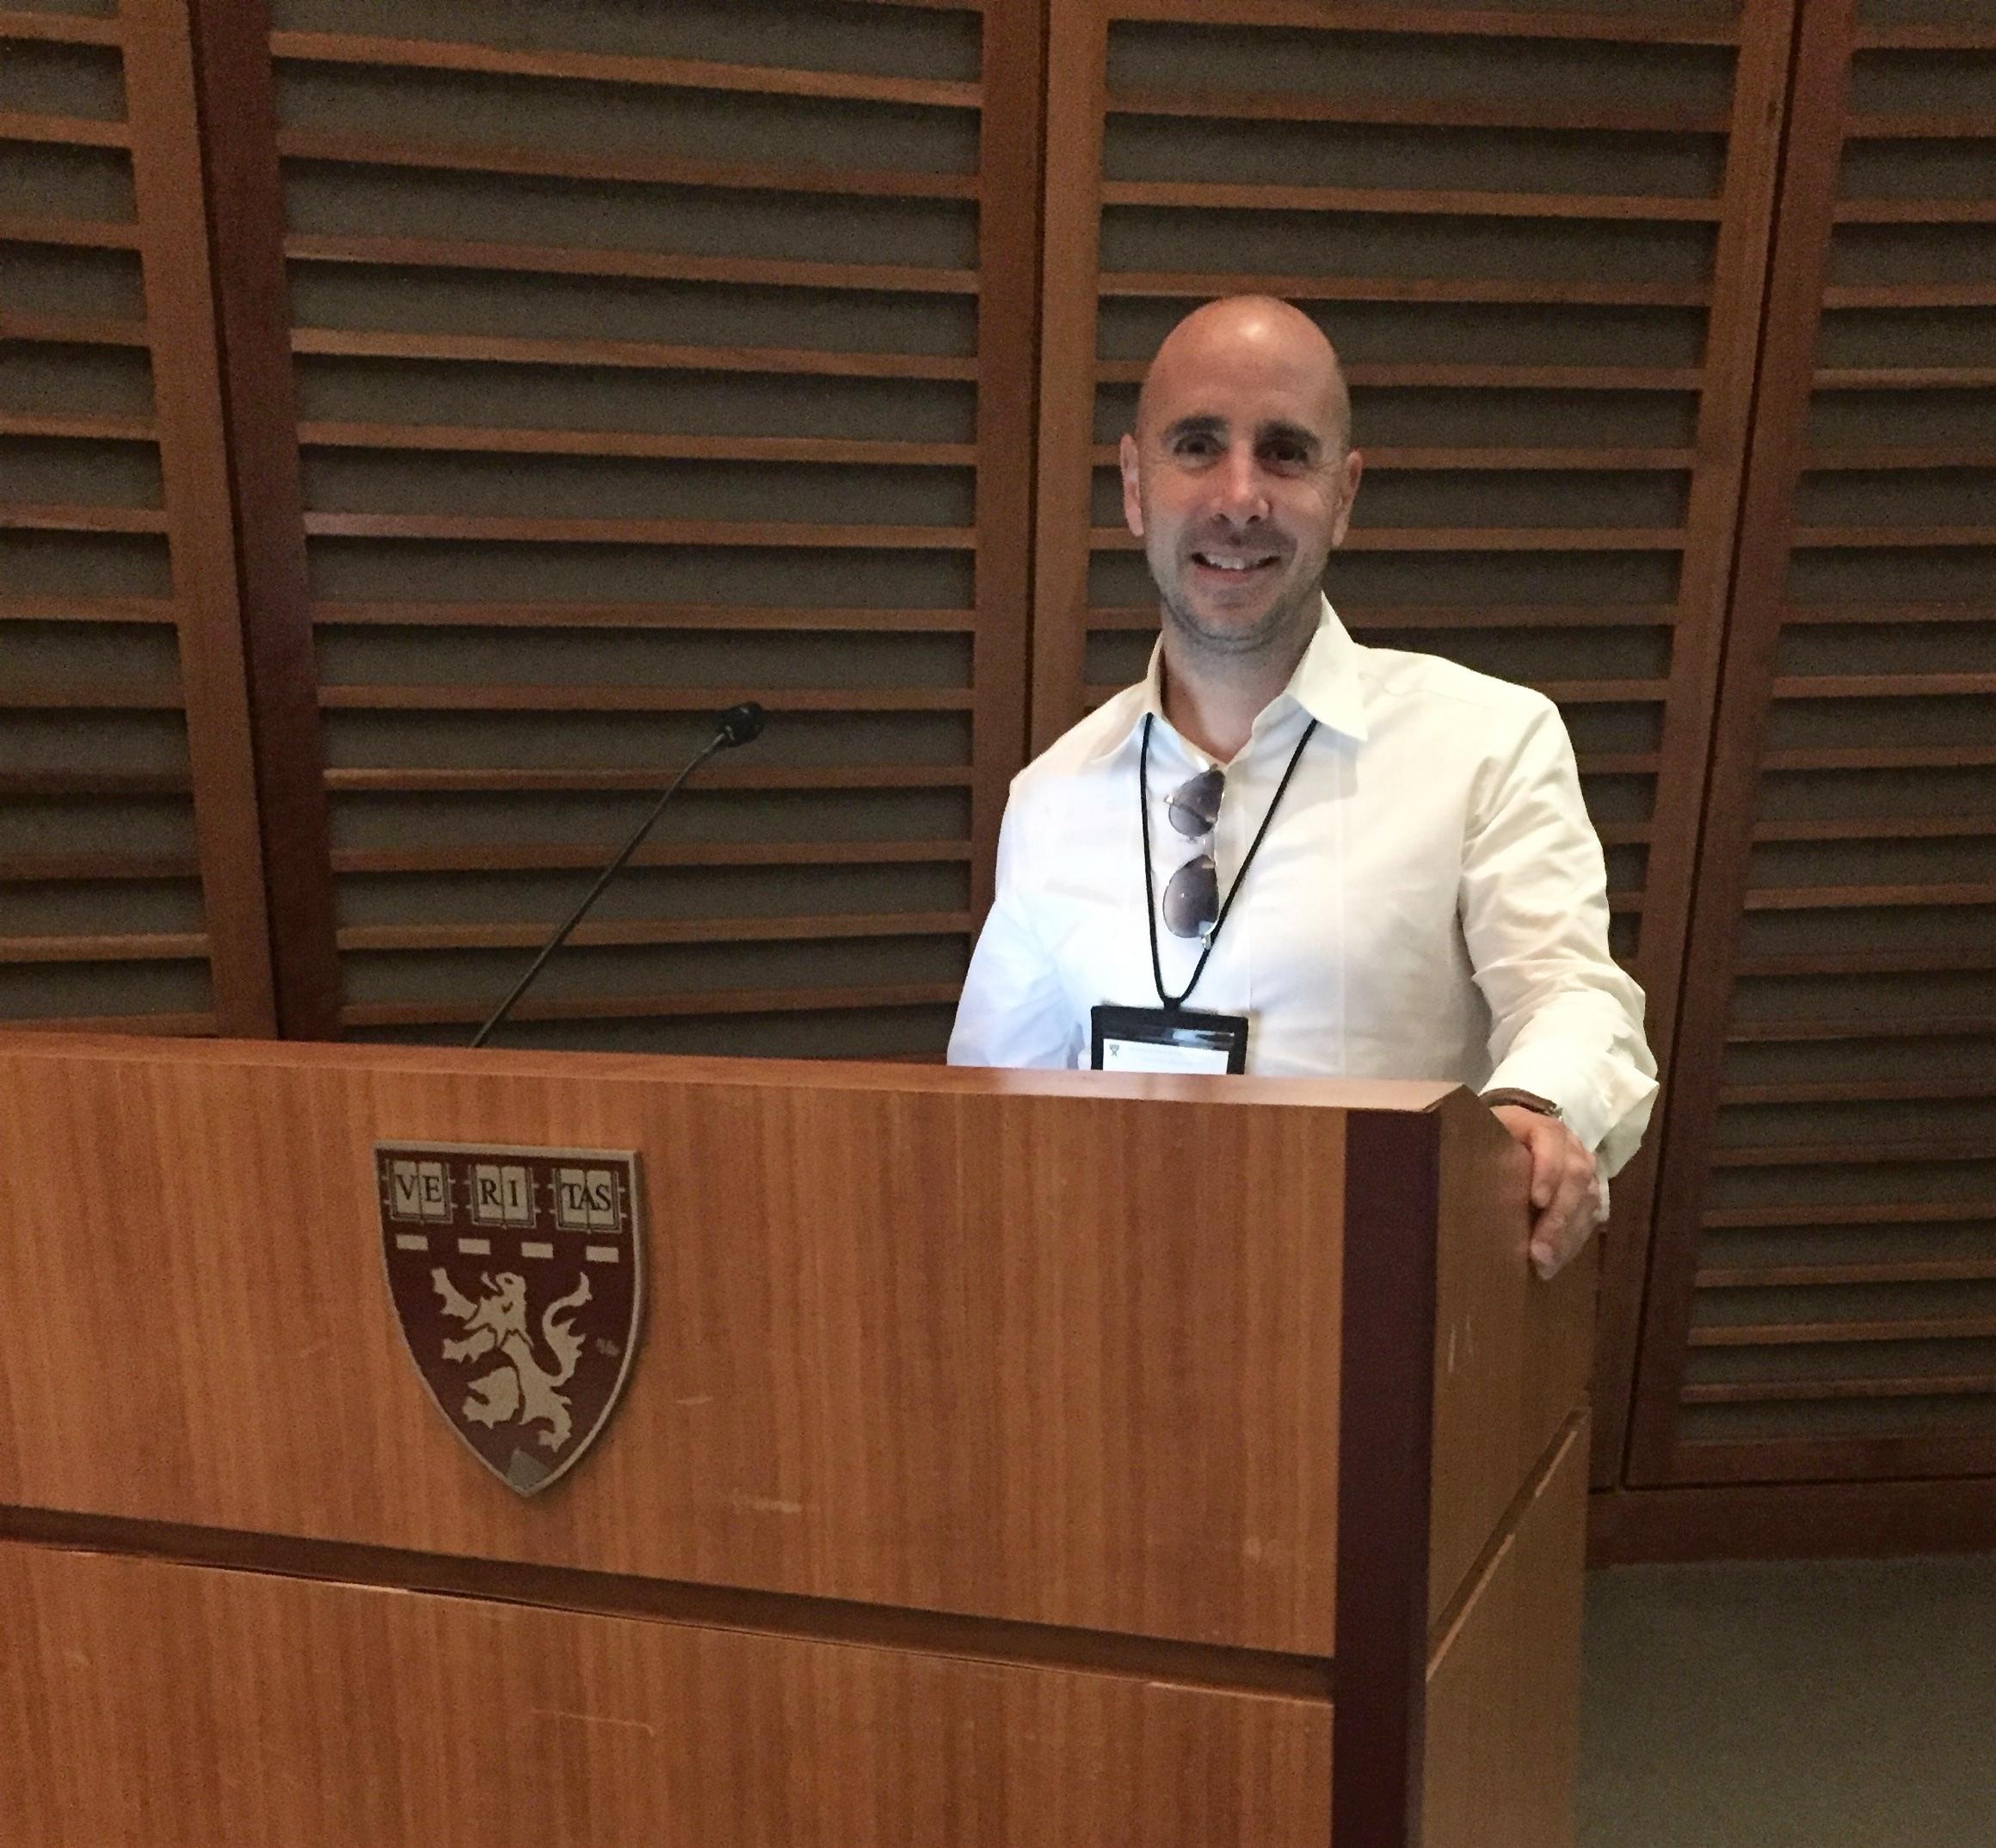 Speaking at Harvard Business School